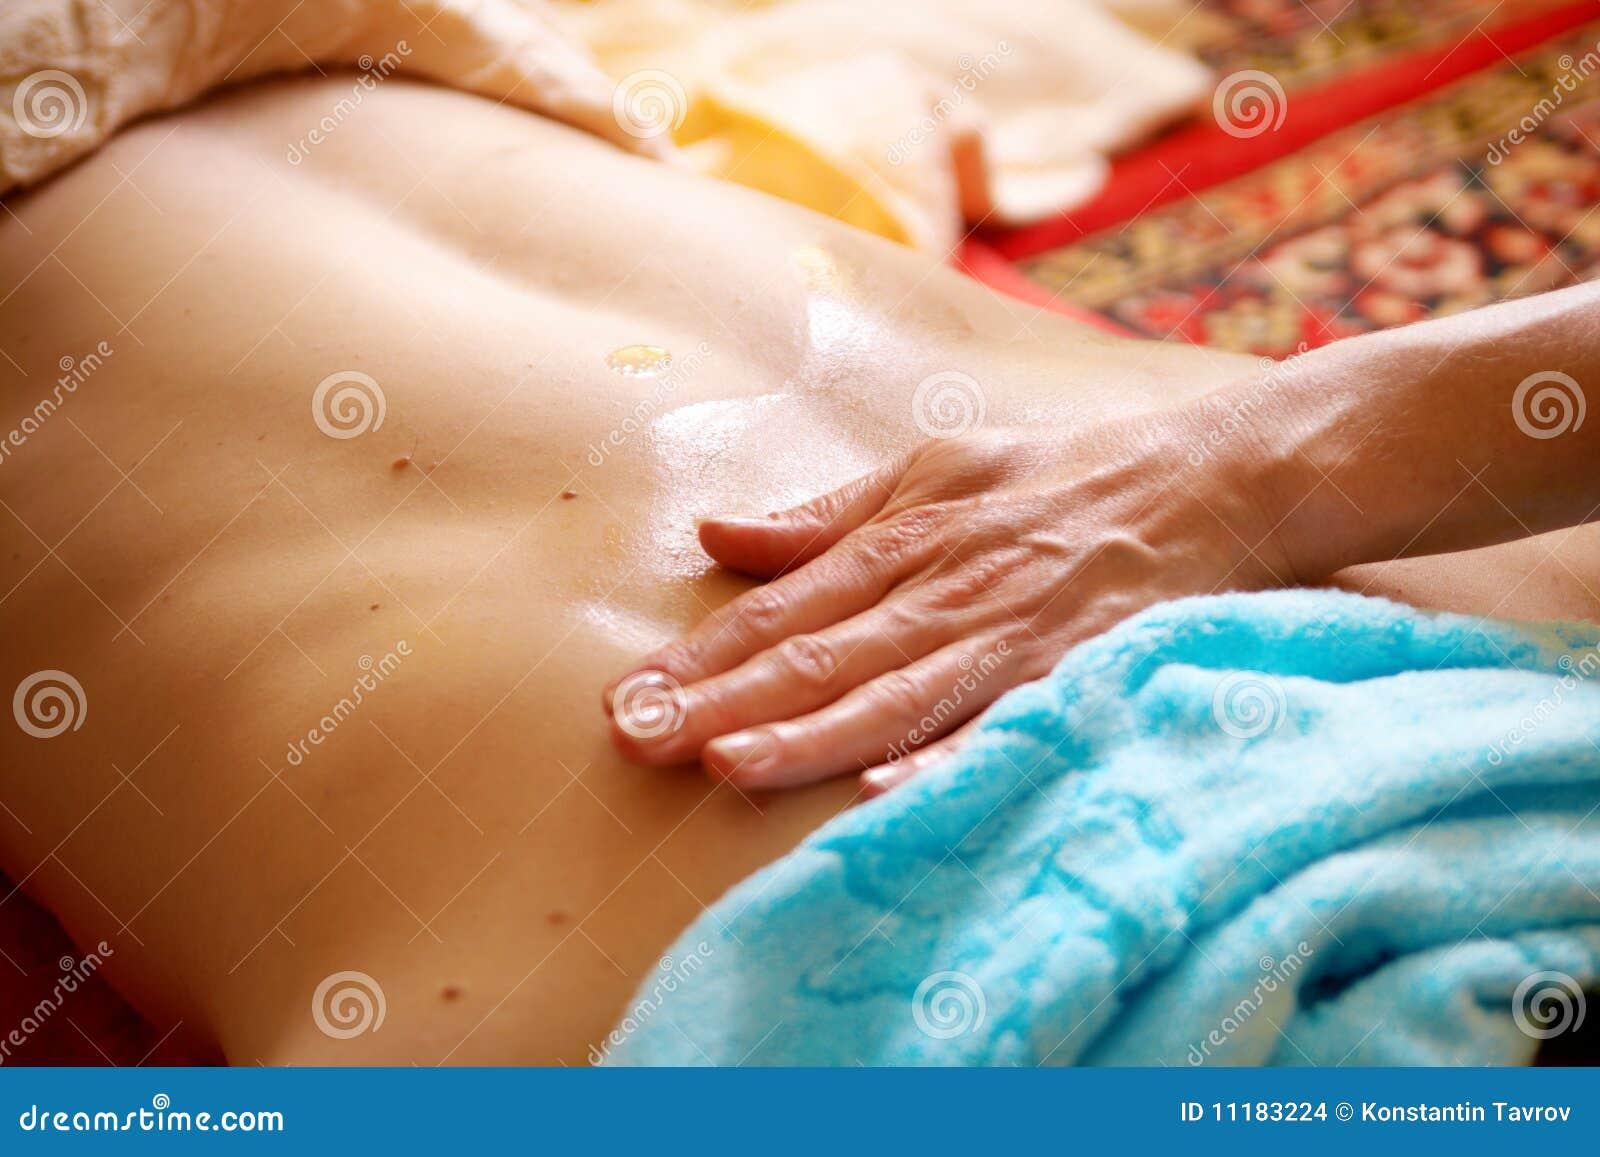 eroguide thai massage massage pige sex